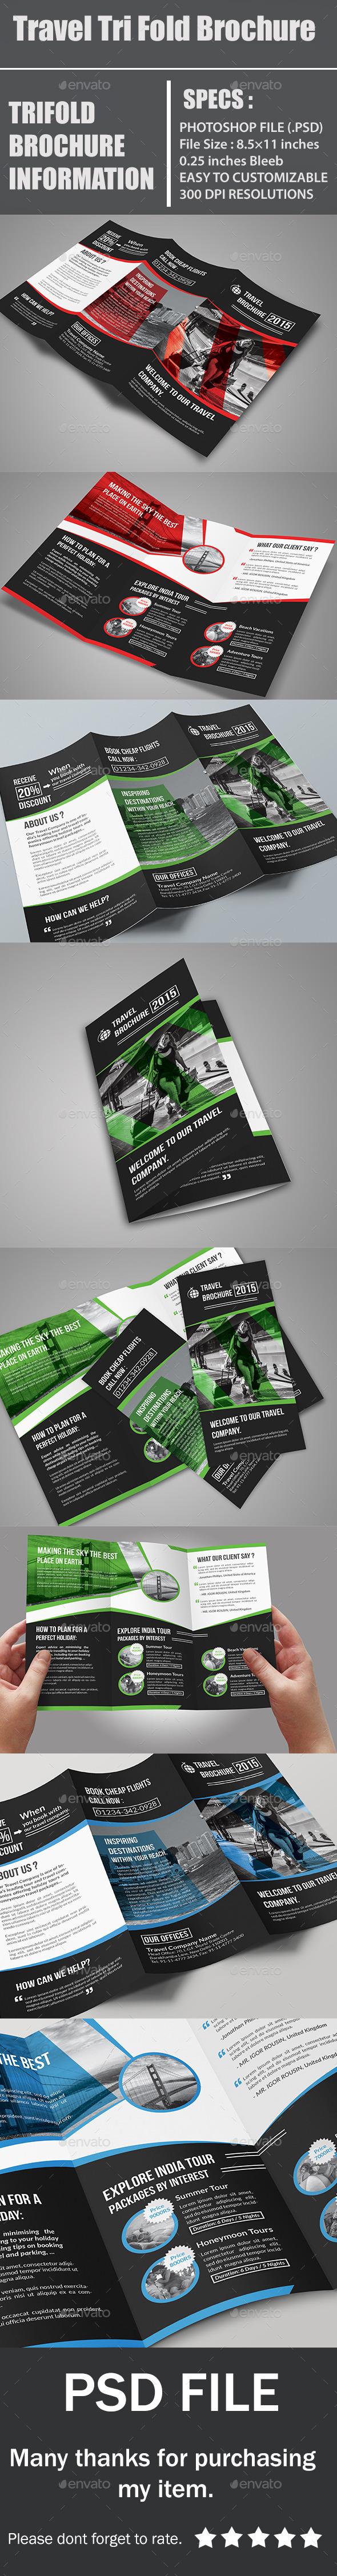 Travel Tri Fold Brochure - Corporate Brochures